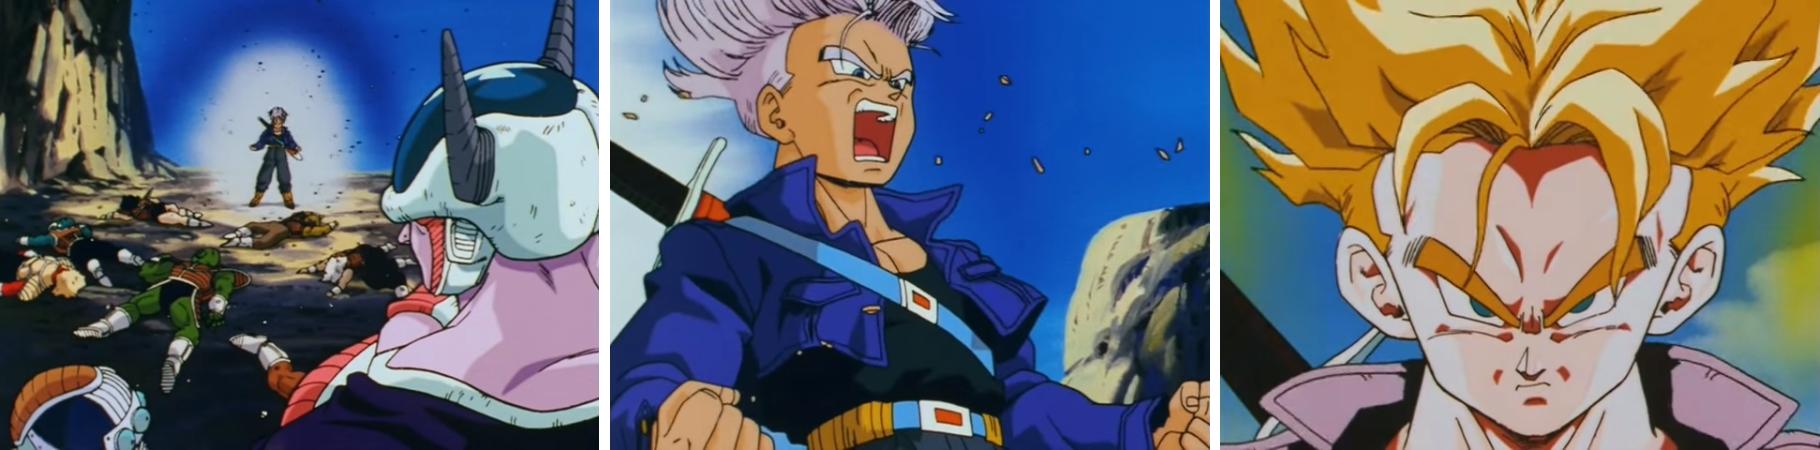 Transformation de Trunks en Super Saiyan dans l'épisode 120 :